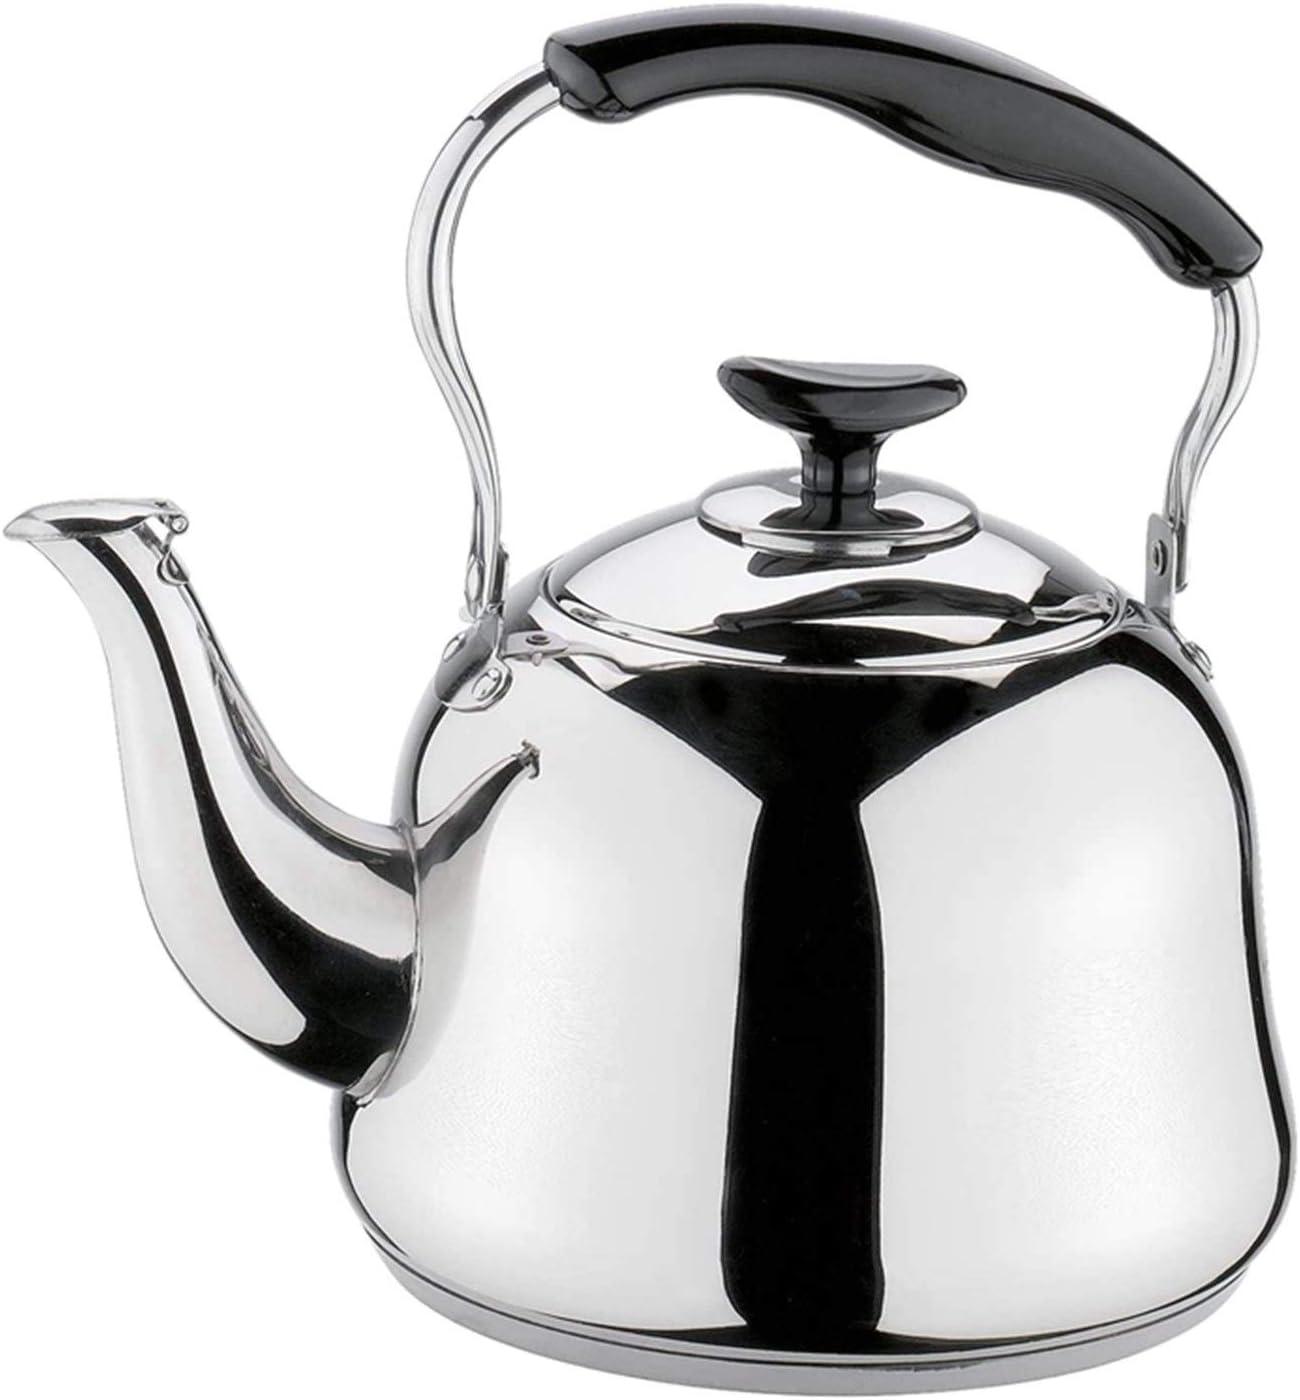 Dpsyszd Tetera 1L Caldera de té con Cartucho filtrante de Ahorro de energía de Acero Inoxidable Caldera de Acero Inoxidable Caldera